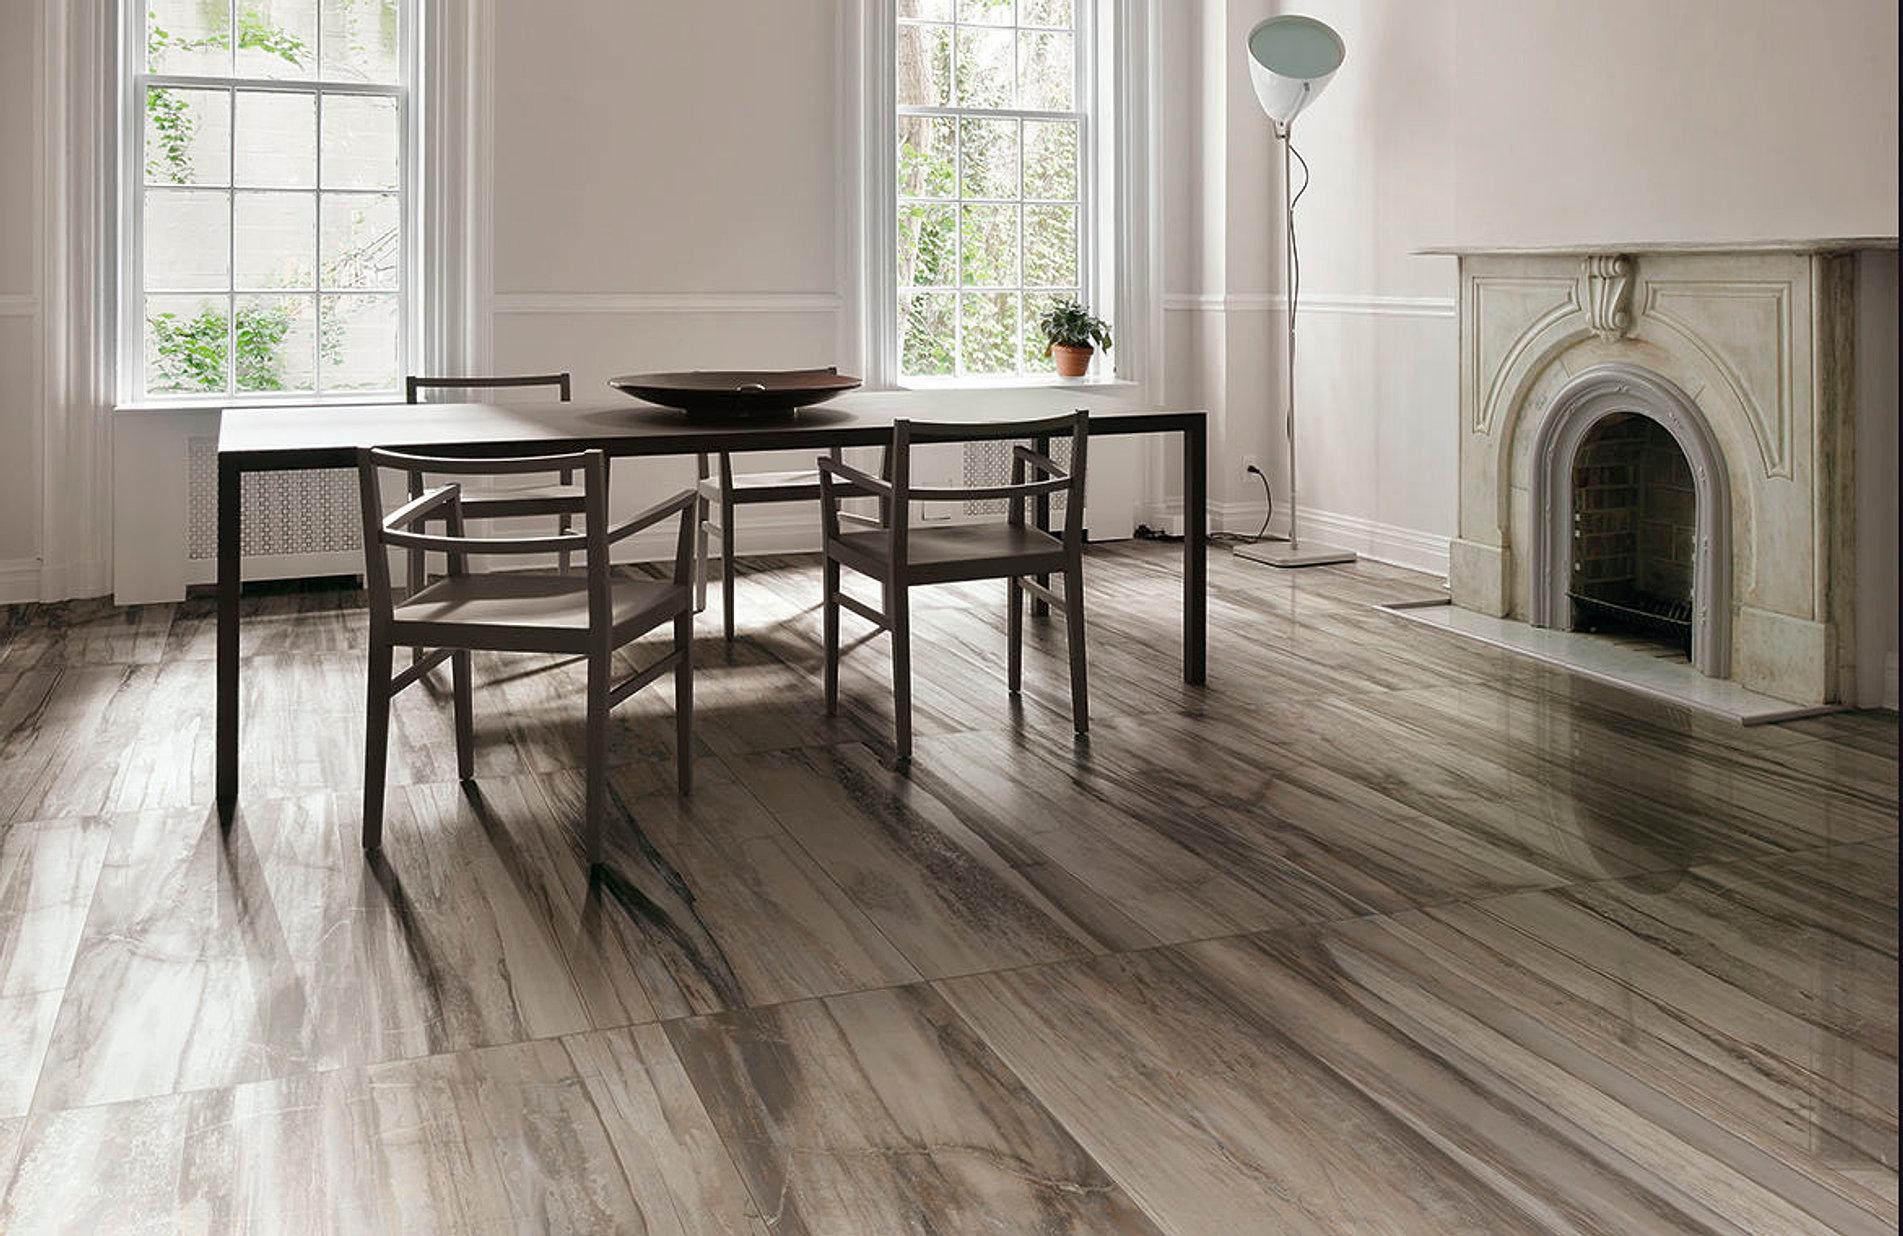 grey-wood-floor-tile-ceramic-floor-tile--stone - Calvetta Brothers Floor Show 216-220-6473